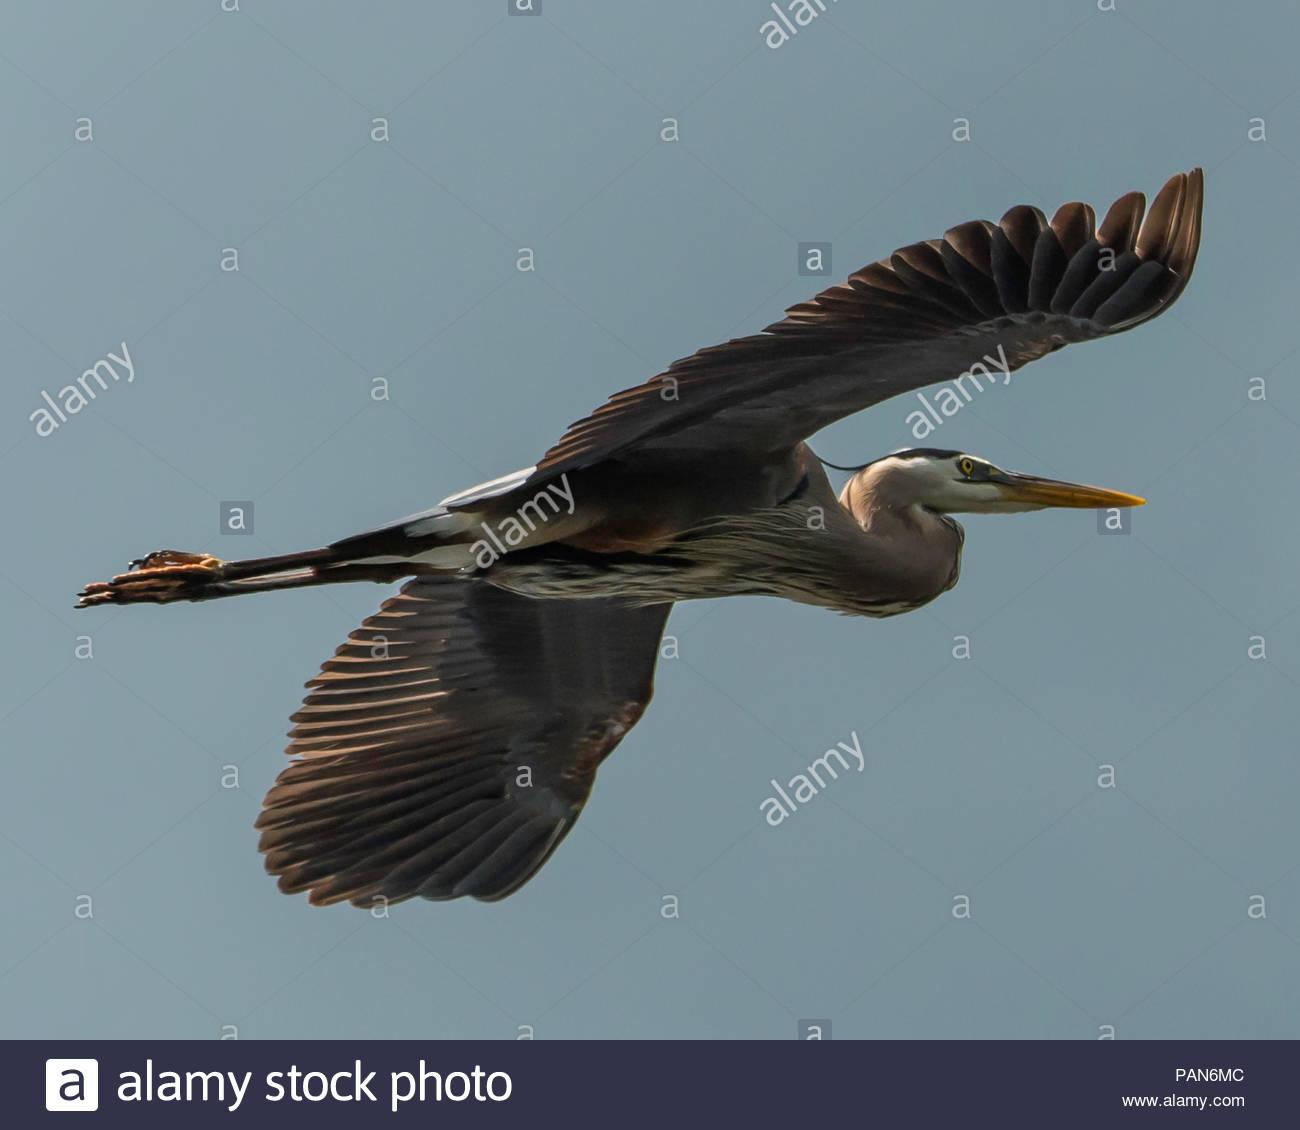 Bird in Flight - Stock Image